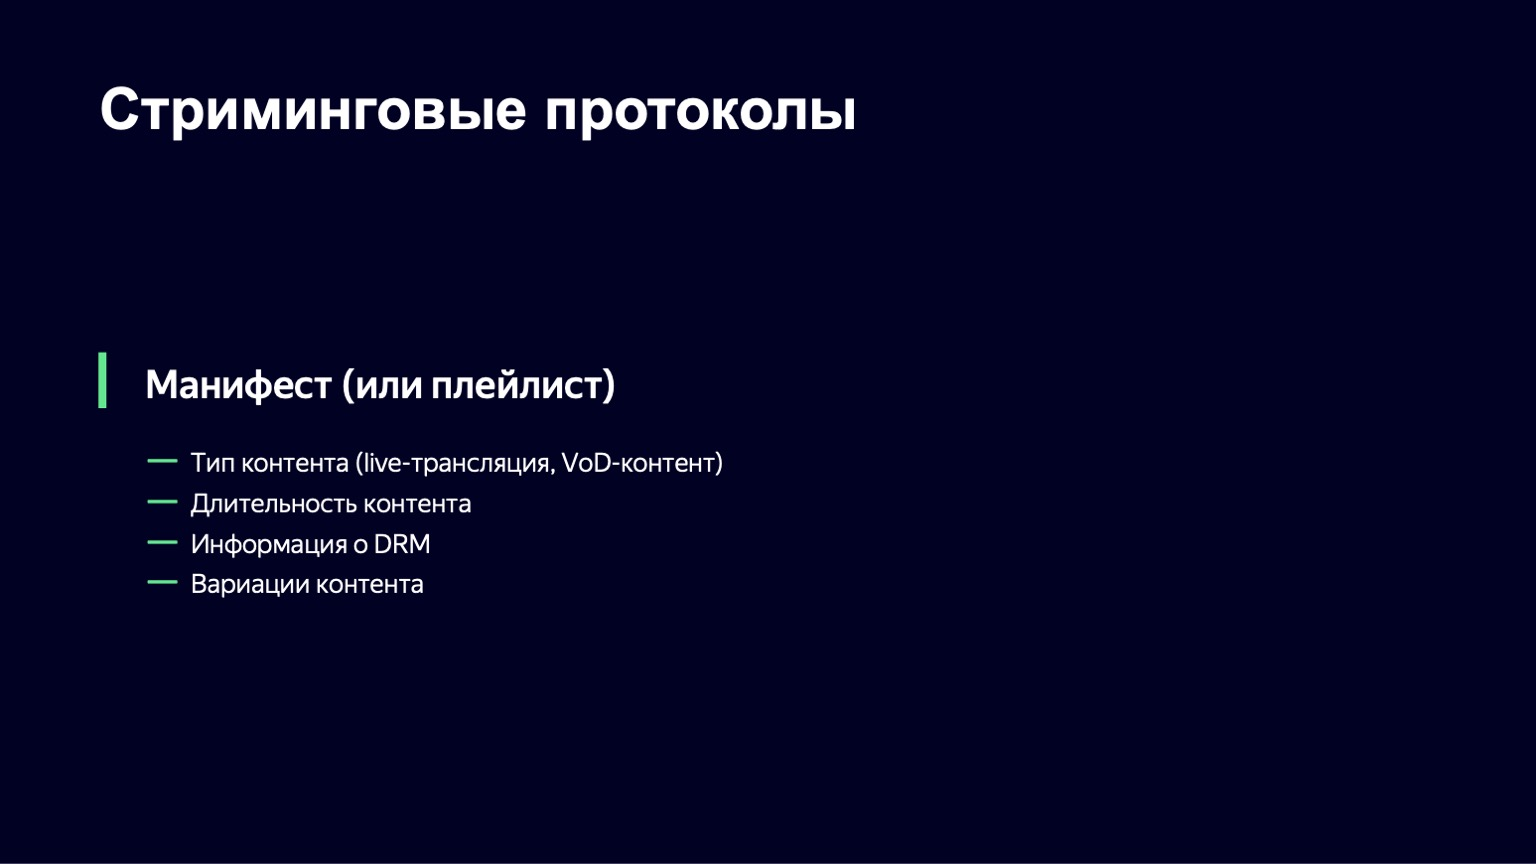 Готовим видеосервис к нагрузке в сотни Гбитс. Доклад Яндекса